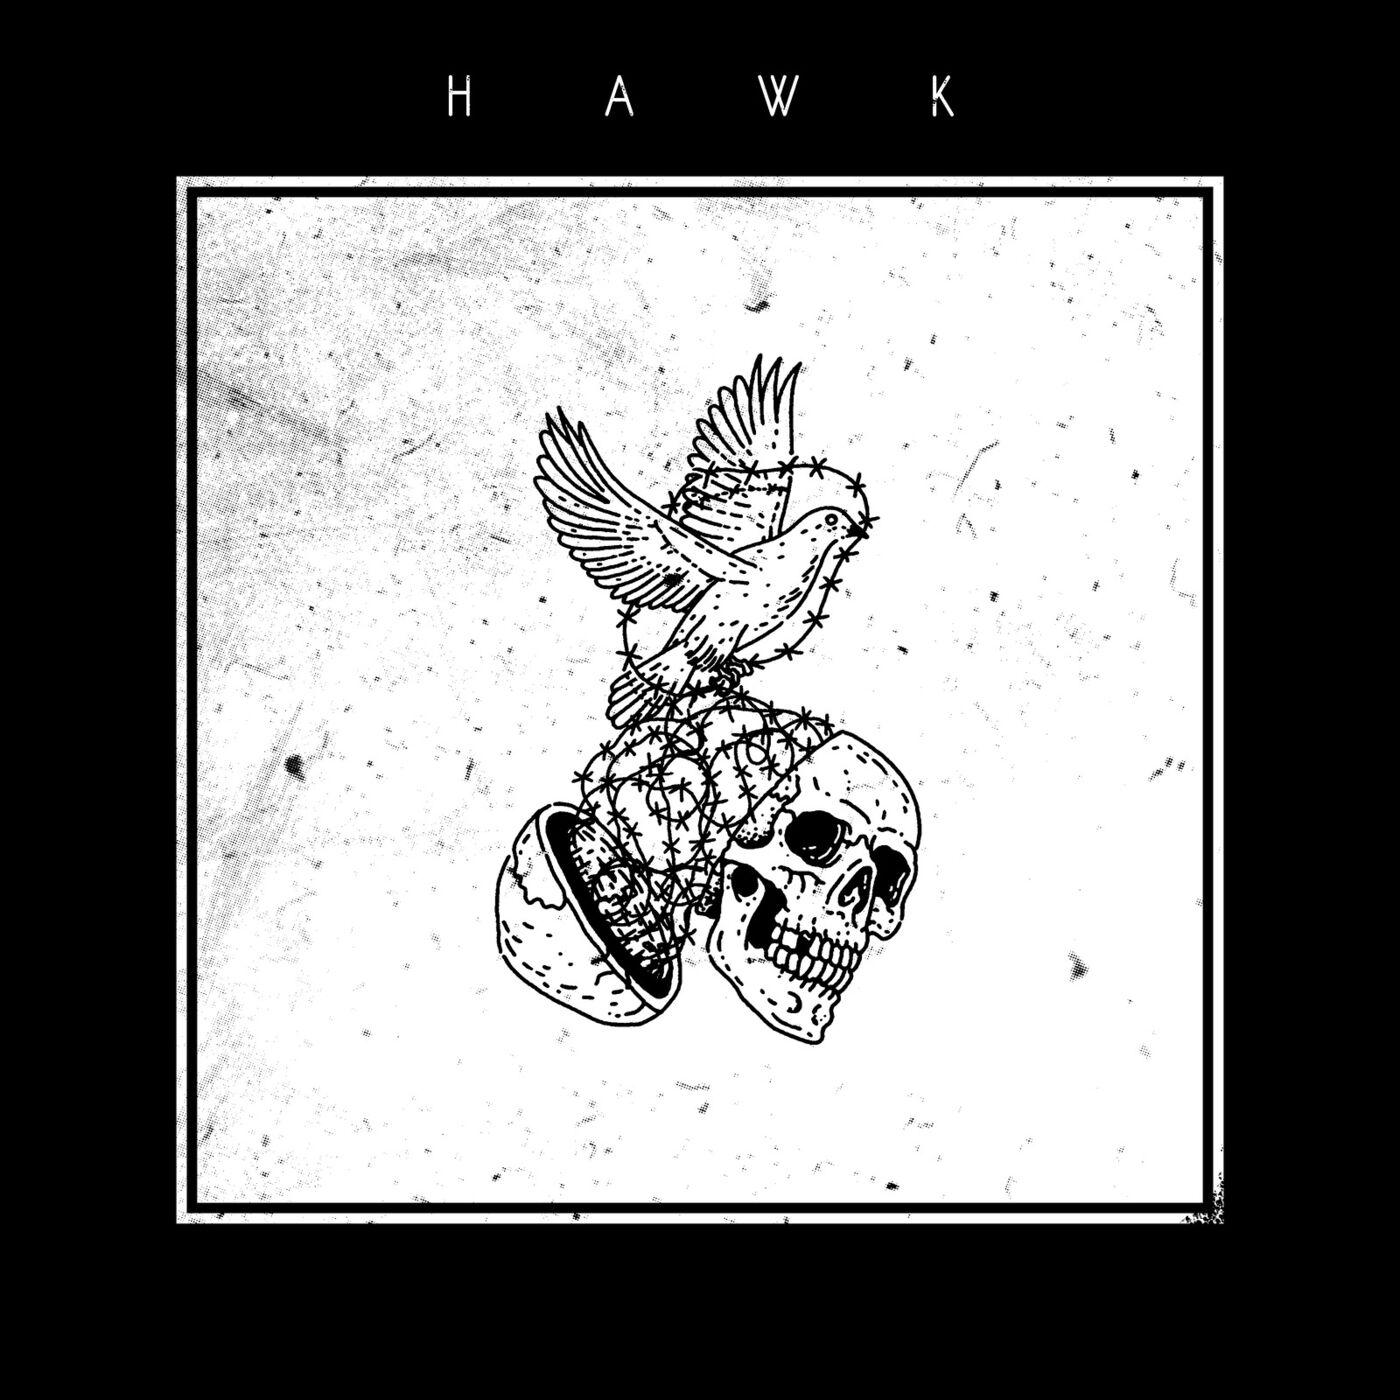 Hawk - Mileage [single] (2019)